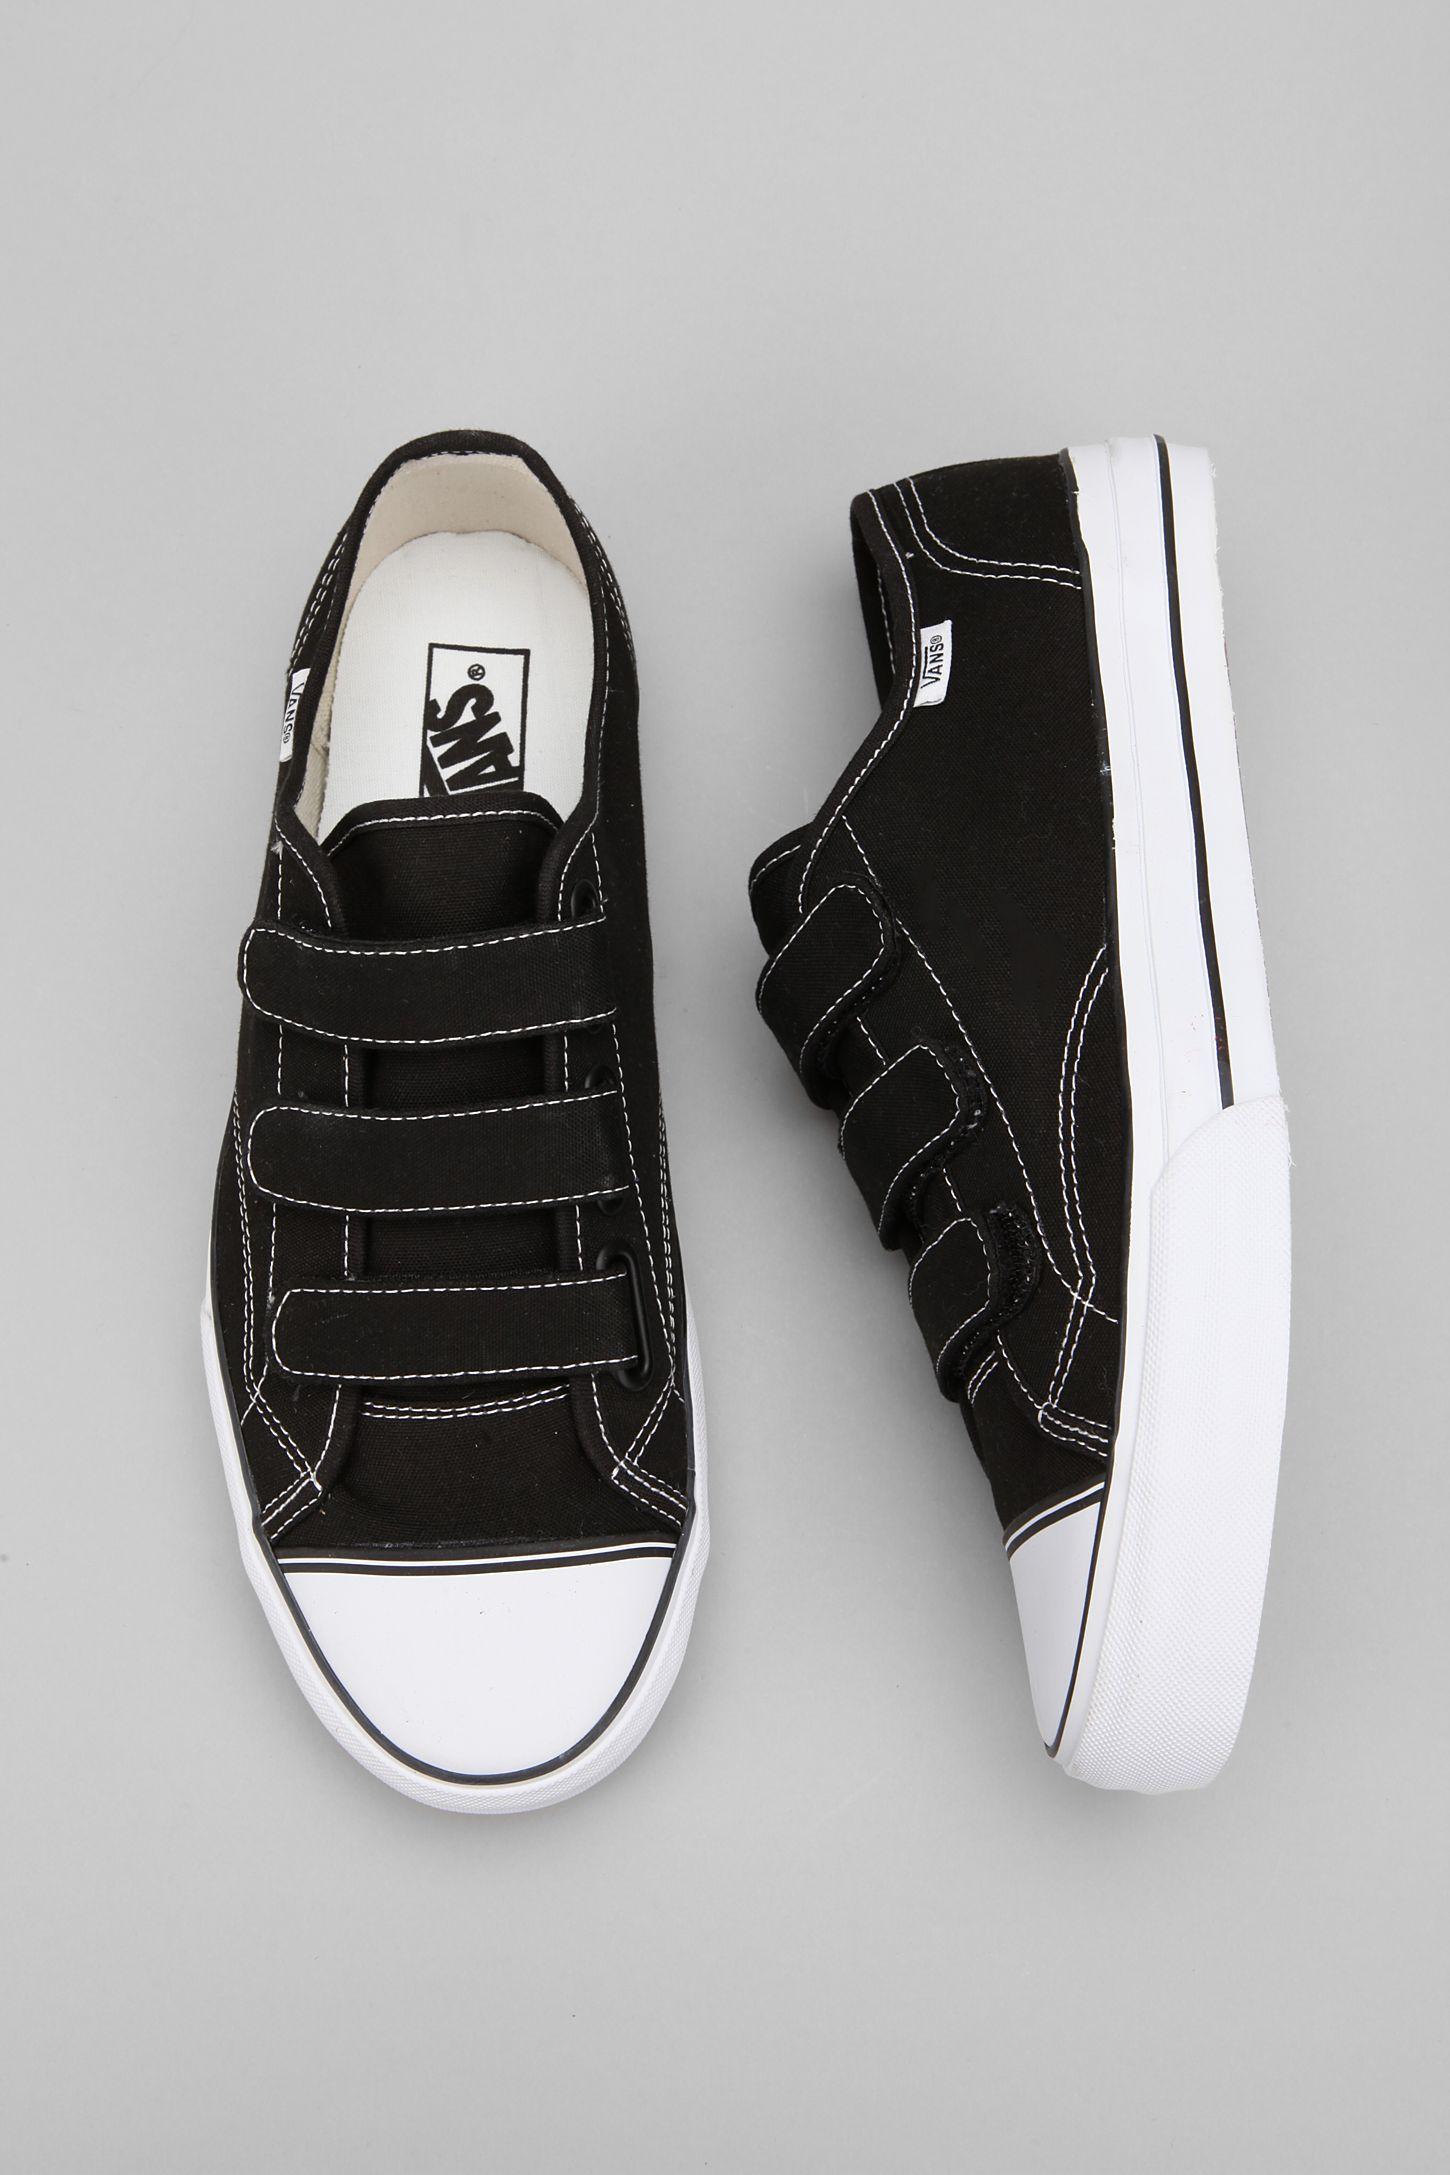 ae2f26aa85 Vans Prison Issue  23 Sneaker